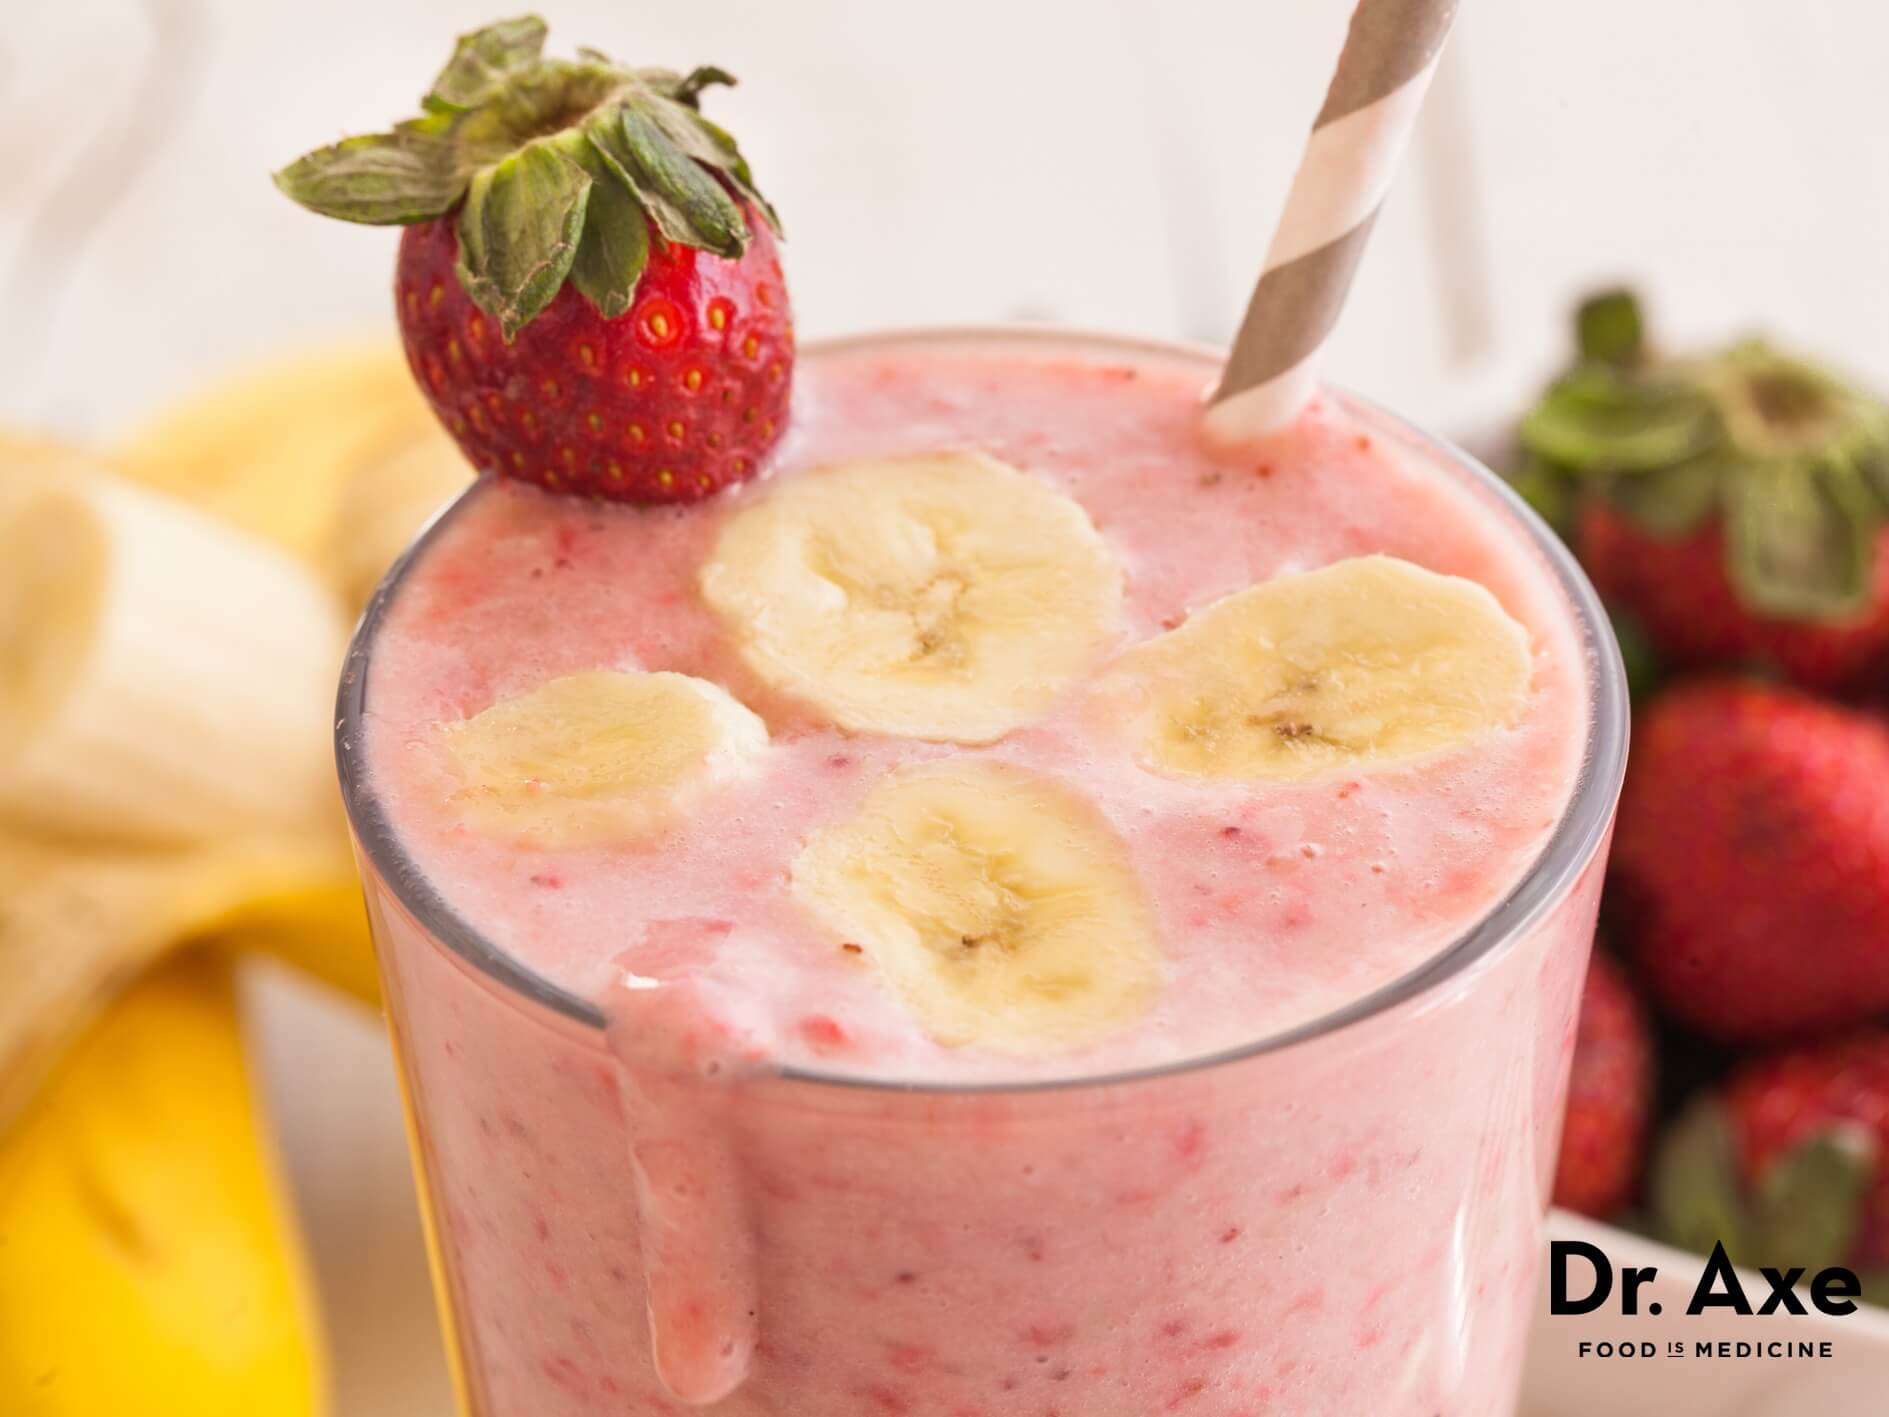 Banana Smoothie Recipes  Strawberry Banana Smoothie Recipe DrAxe